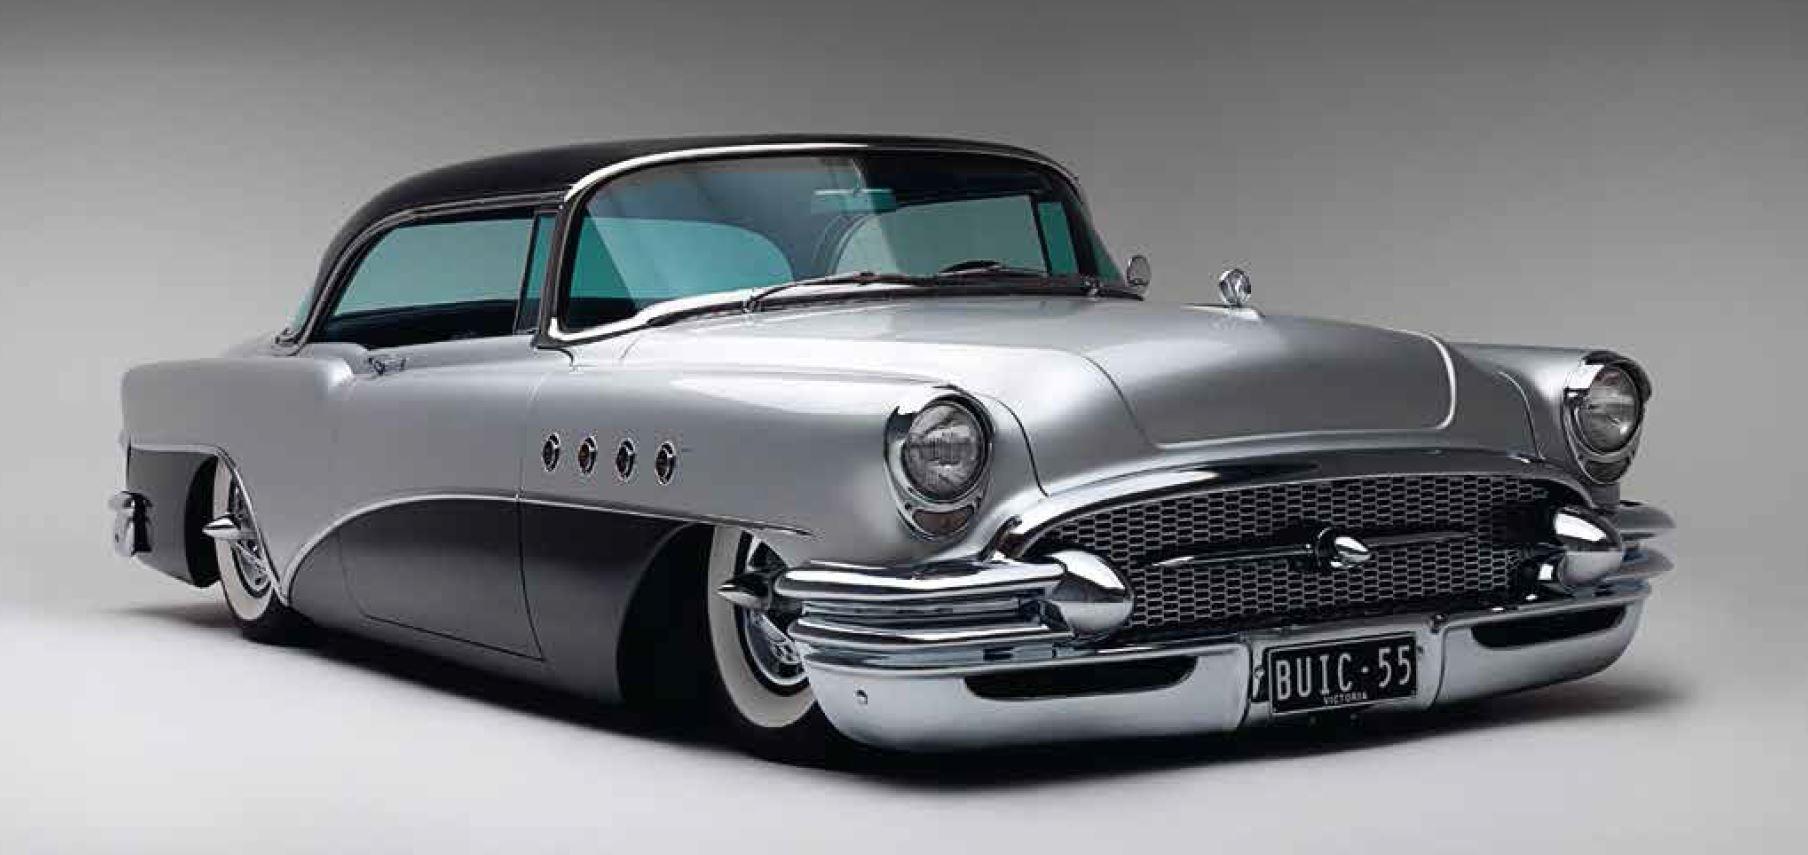 Car Hdr Wallpaper Calling All Classic Car Enthusiasts Potchefstroom Herald